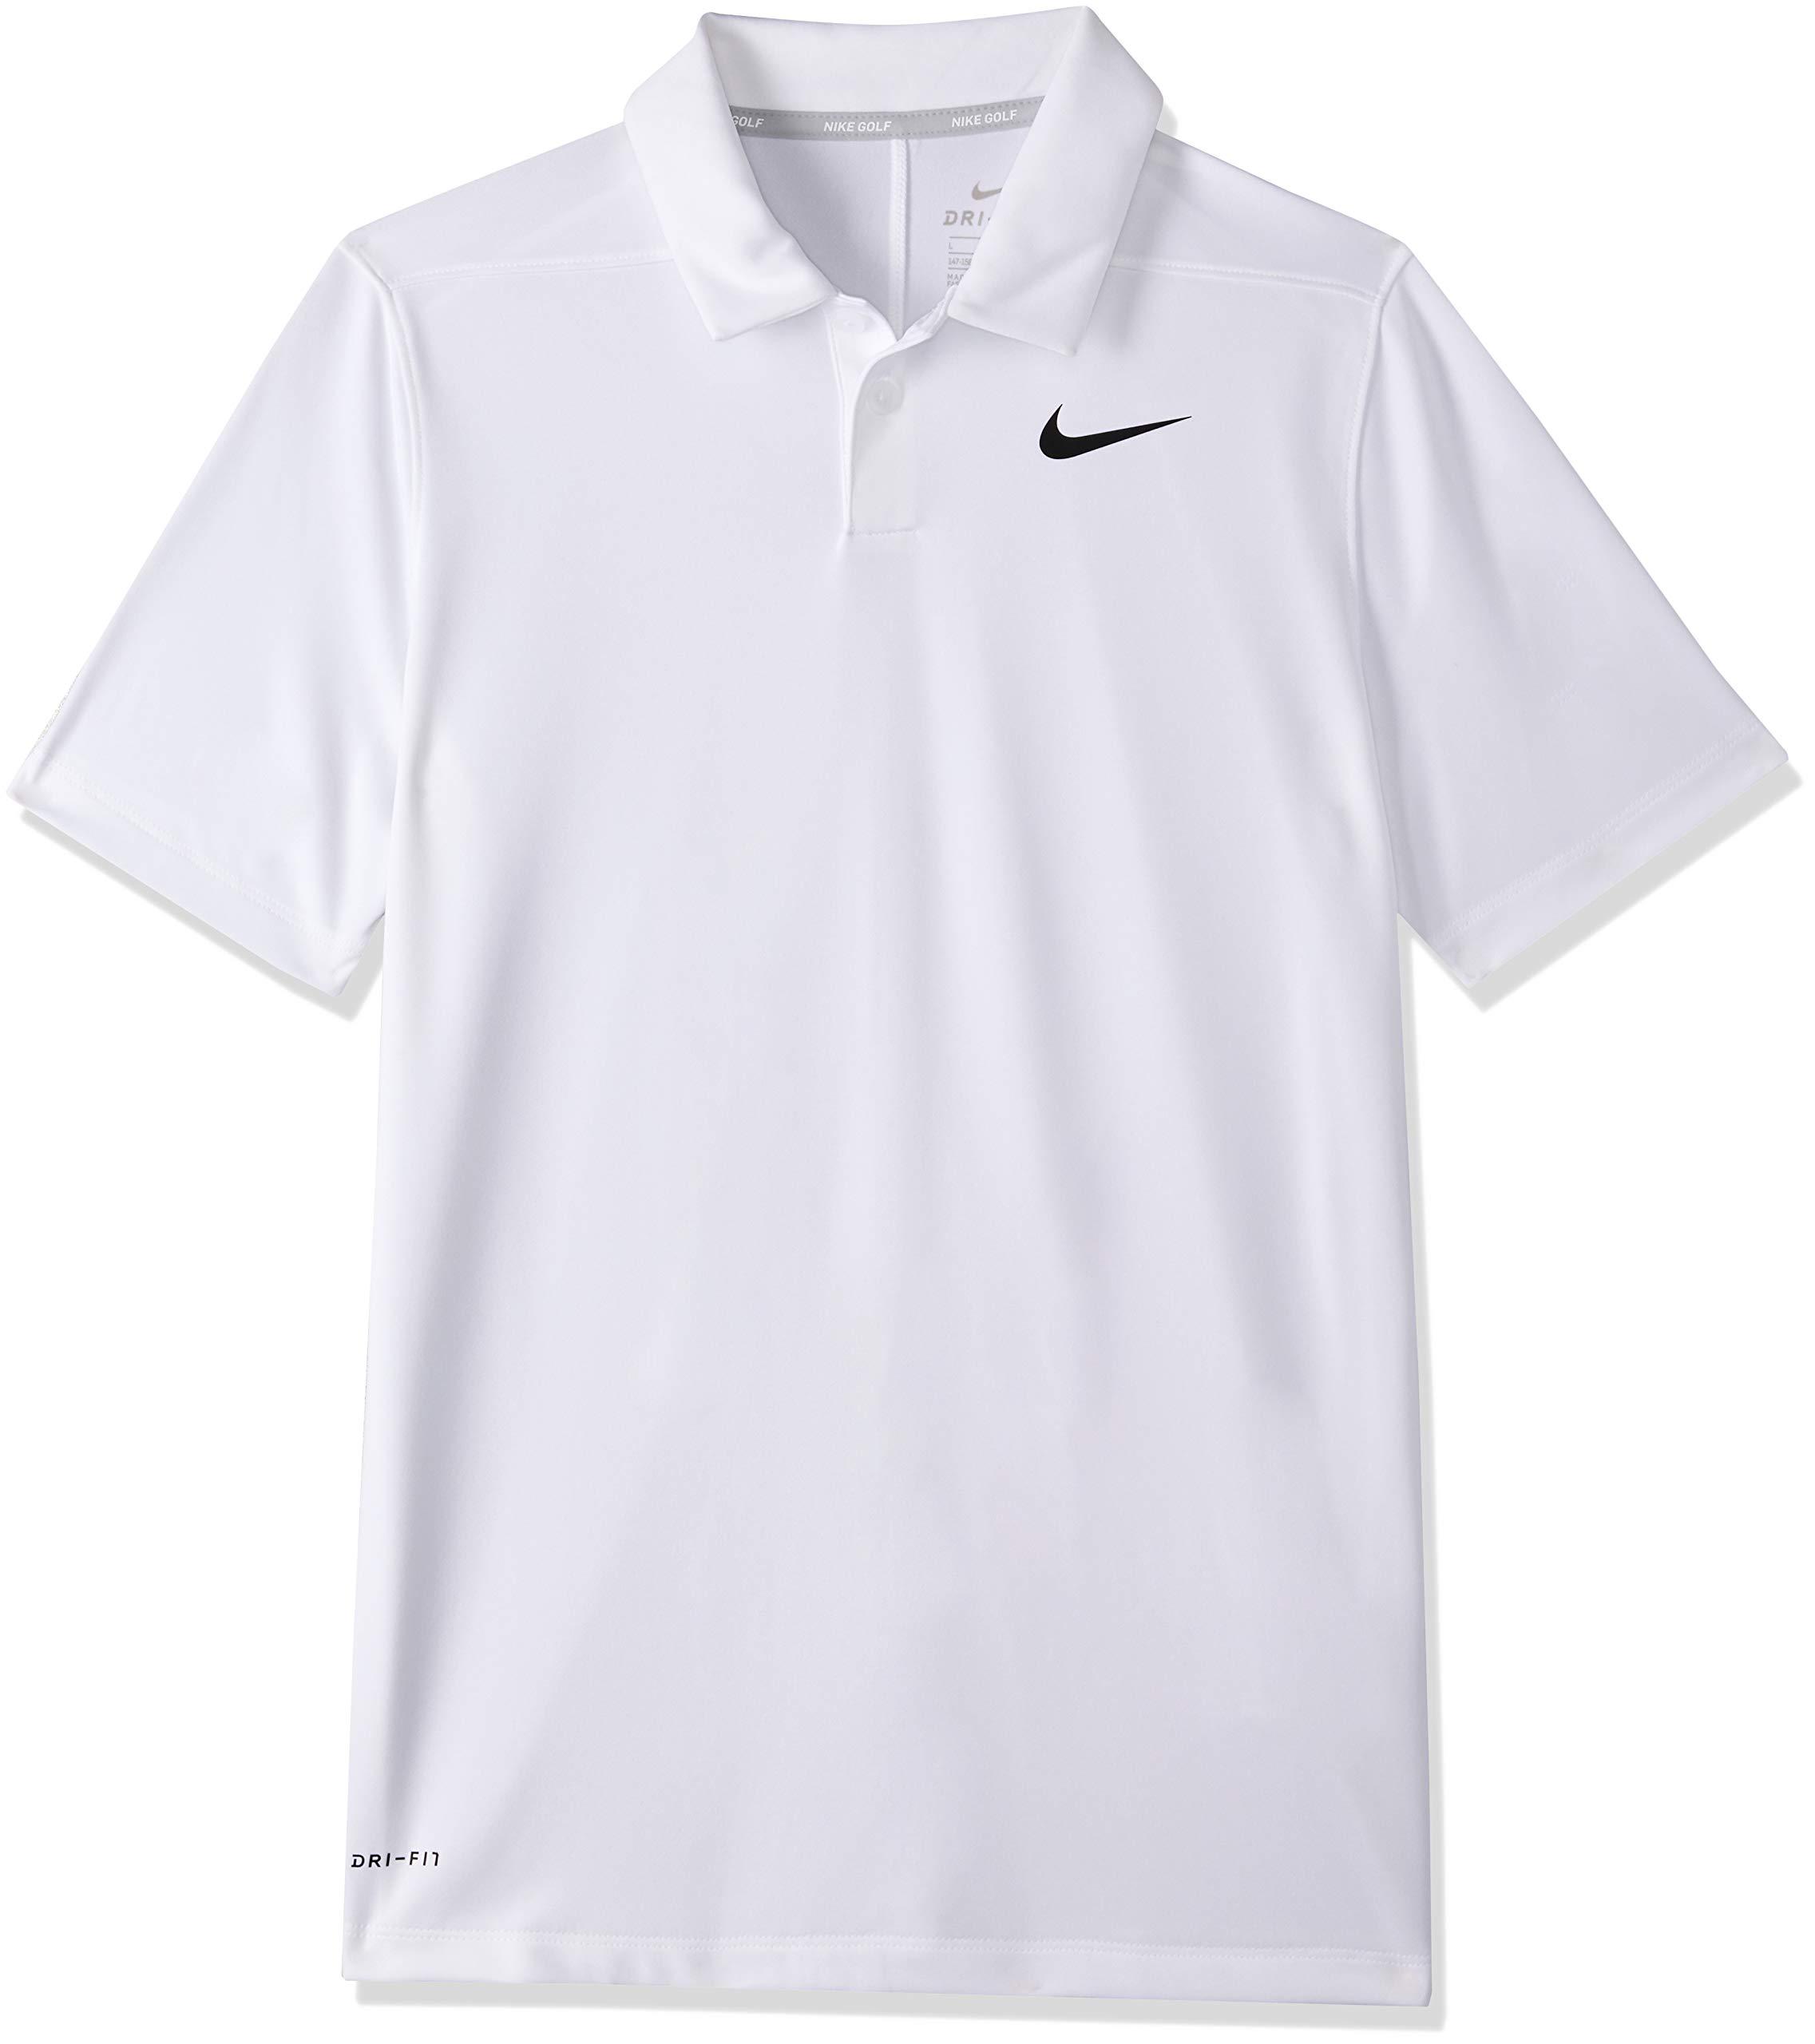 Nike Dri Fit Victory Golf Polo 2019 Boys White/Black Youth X-Large